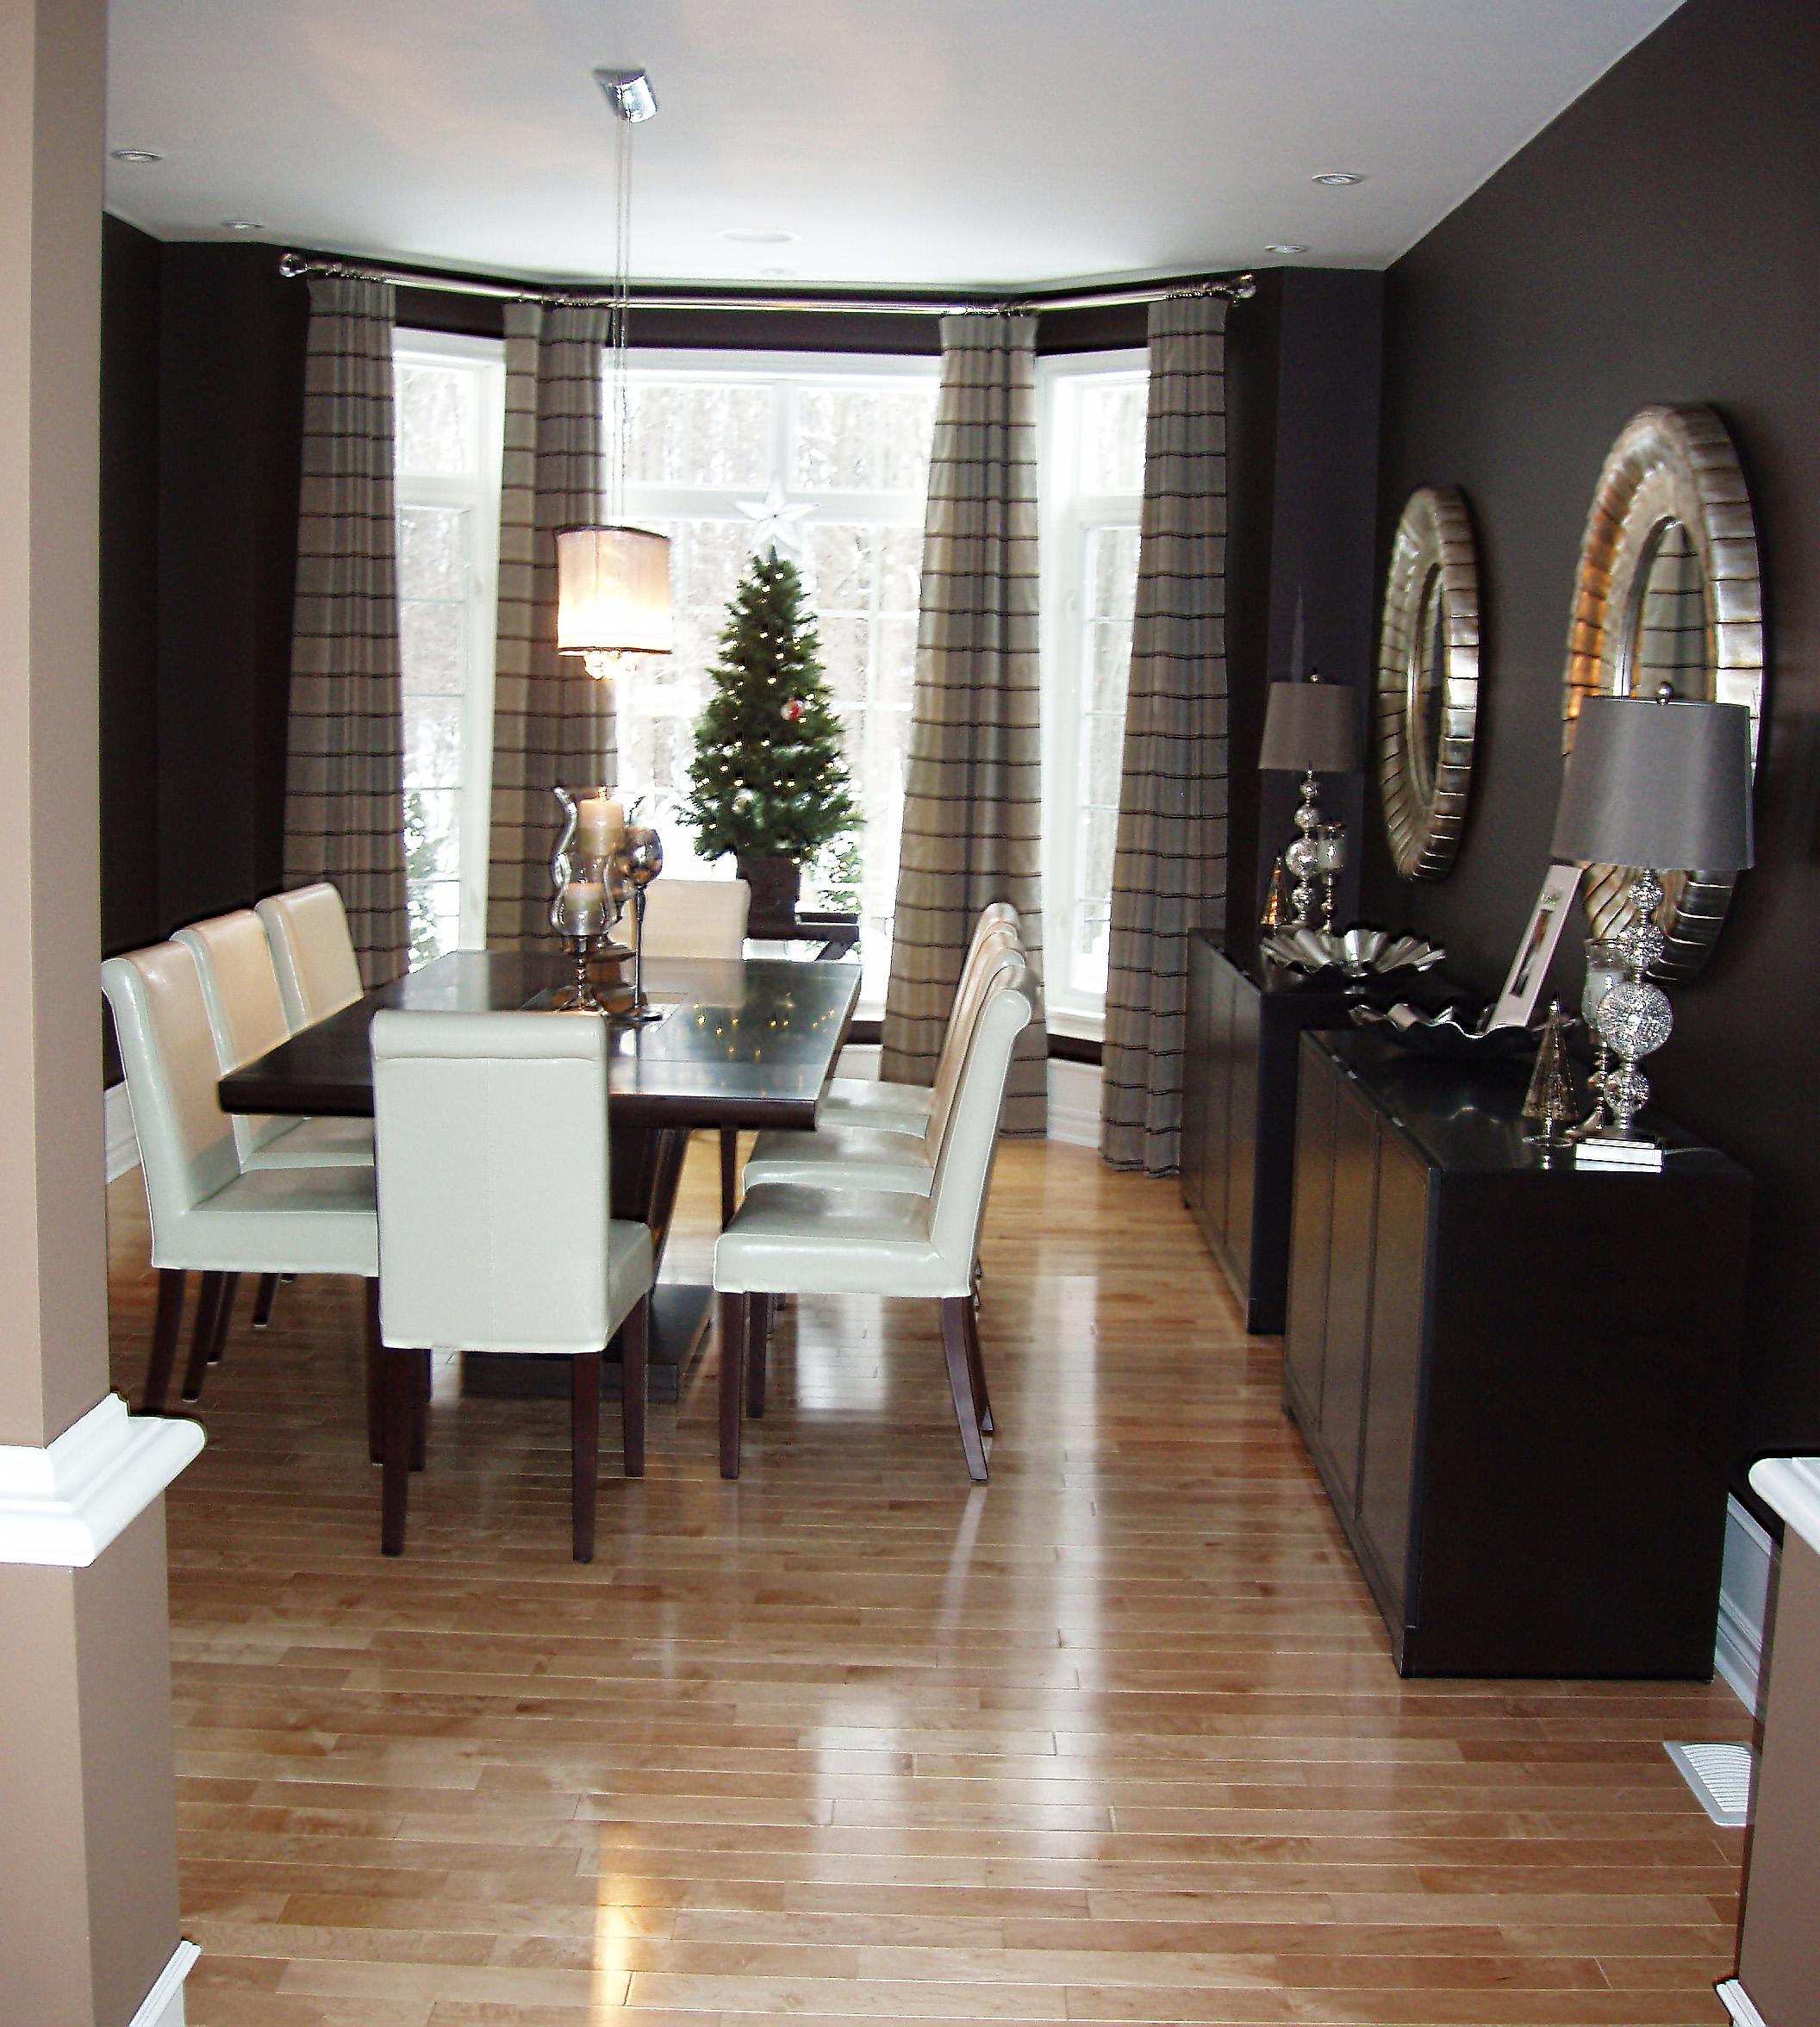 Holiday Home Decor - Ottawa South